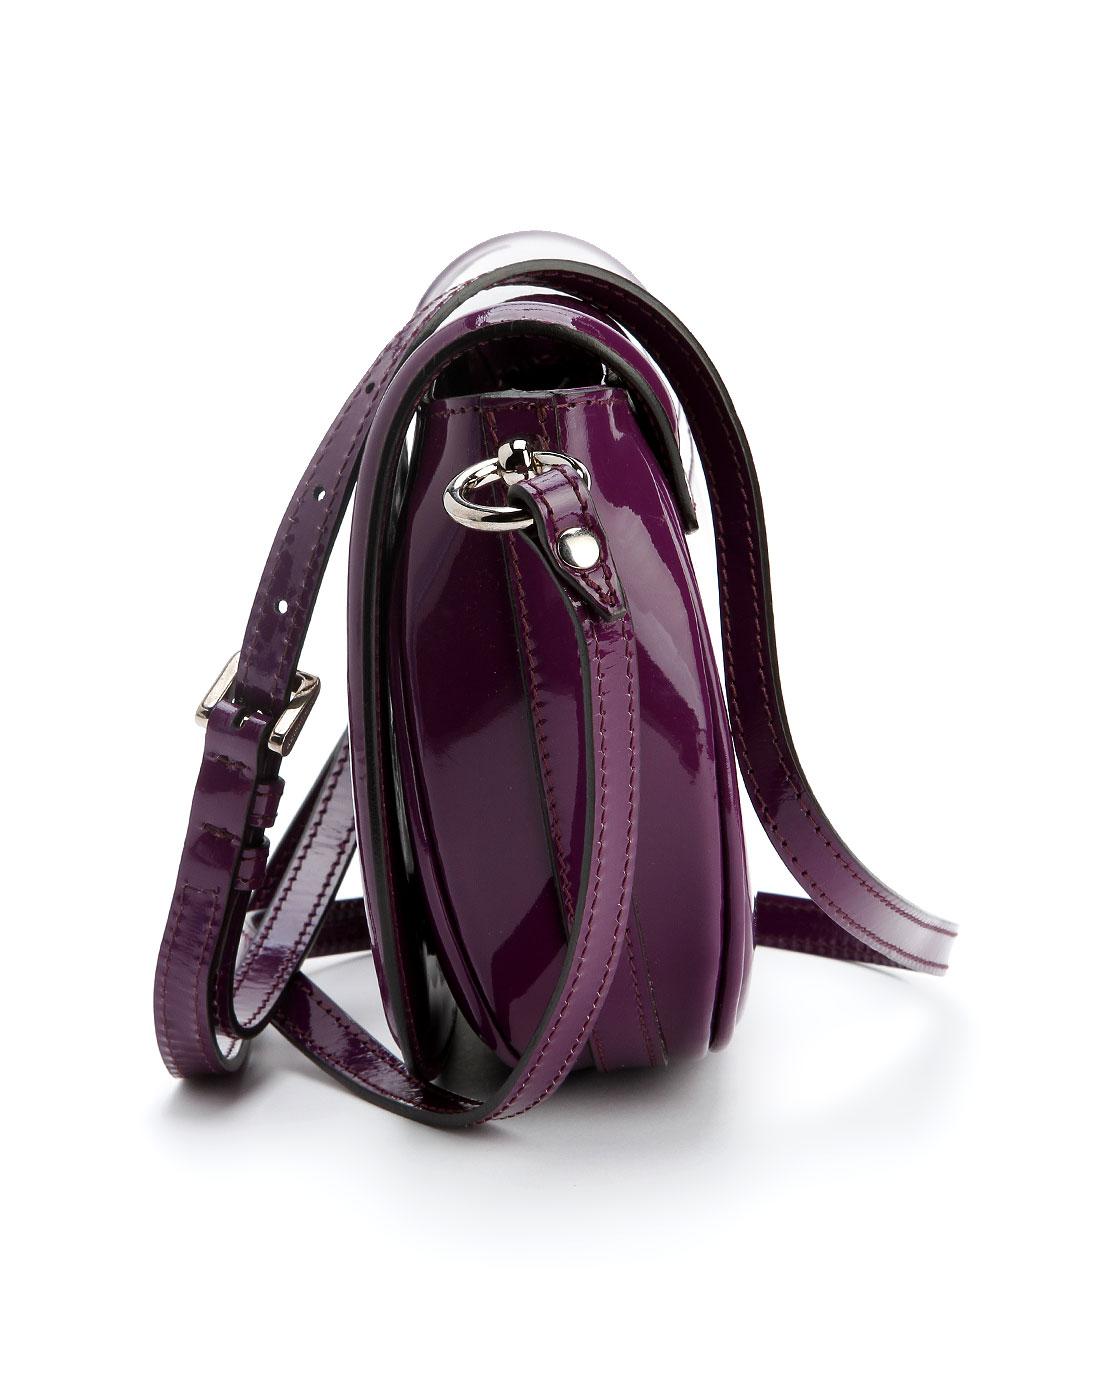 burberry名品特惠专场女款紫色个性斜挎包